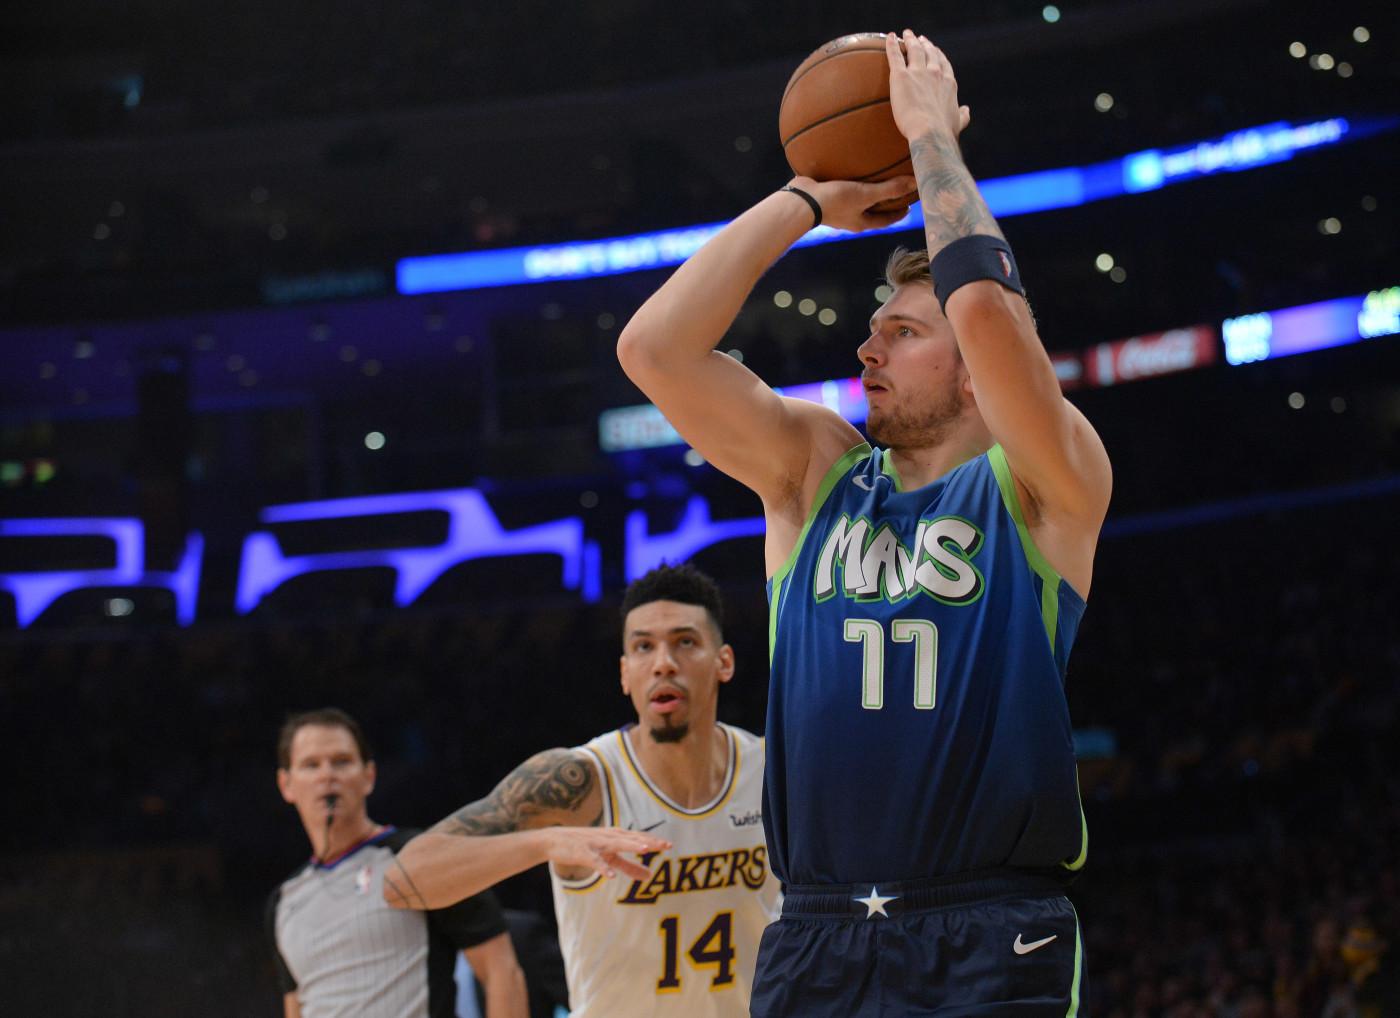 Luka Doncic Lakers Mavericks 1 LA Dec 2019